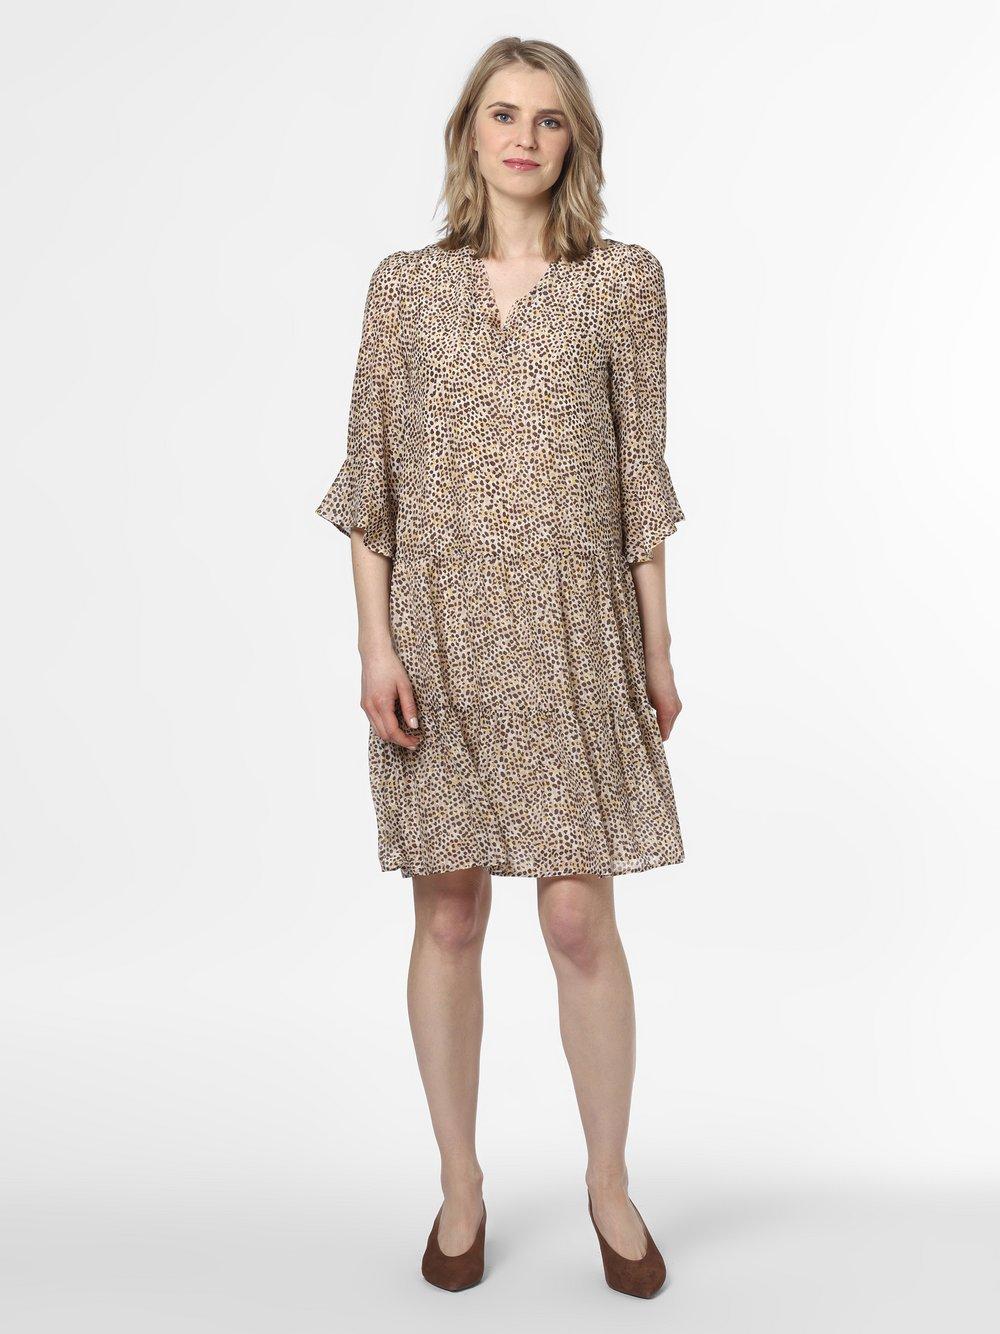 Marc Cain Collections – Damska sukienka jedwabna, beżowy Van Graaf 466707-0001